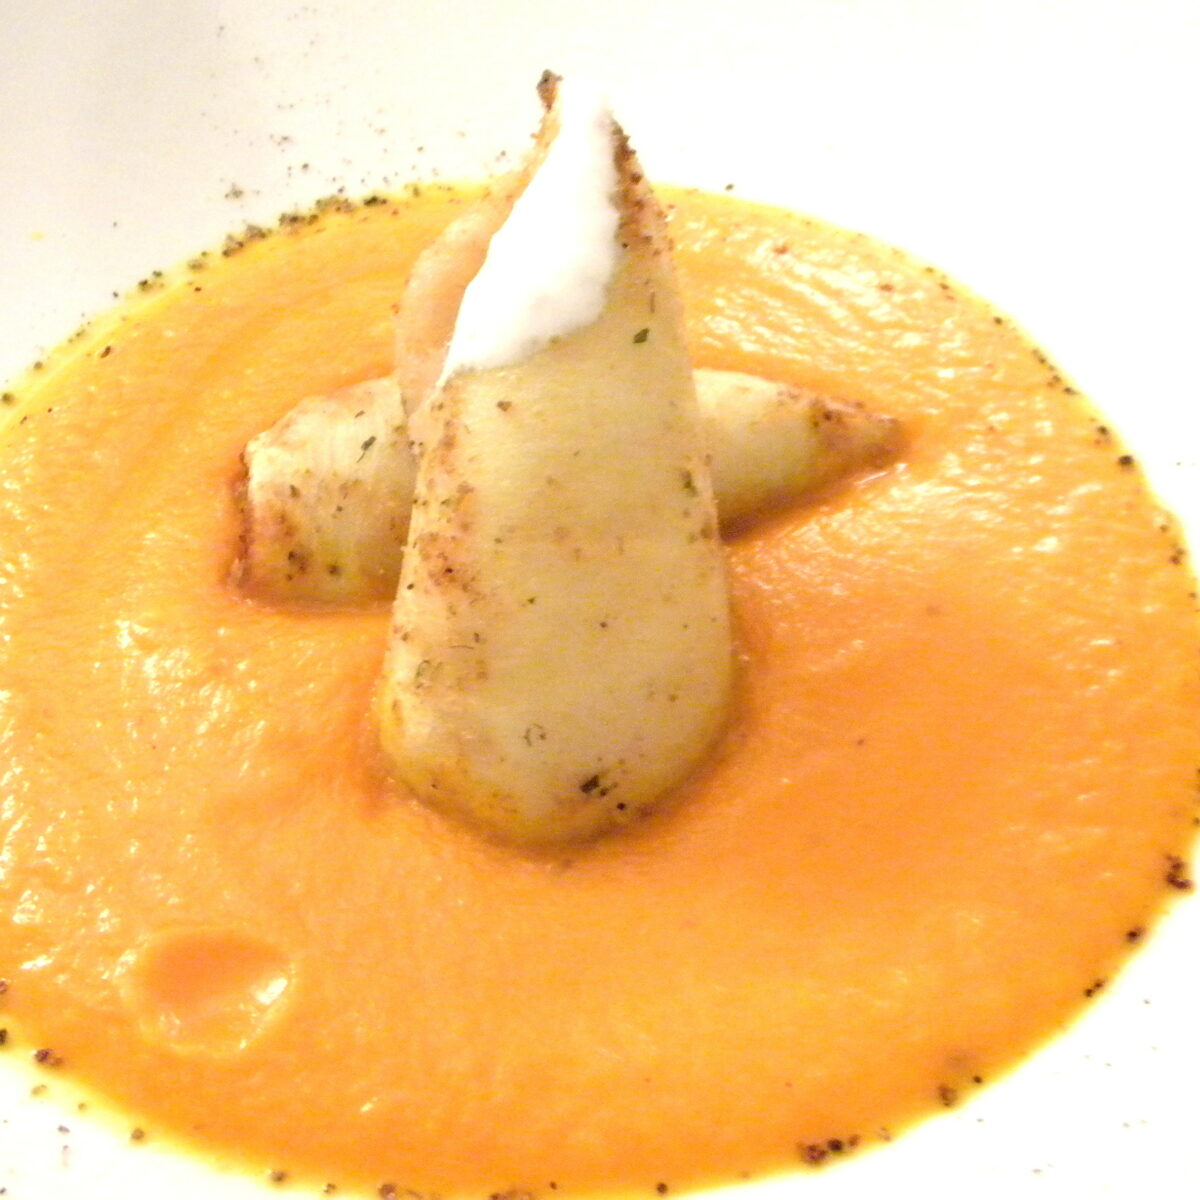 Crema di carote con i calamari: anti-aging